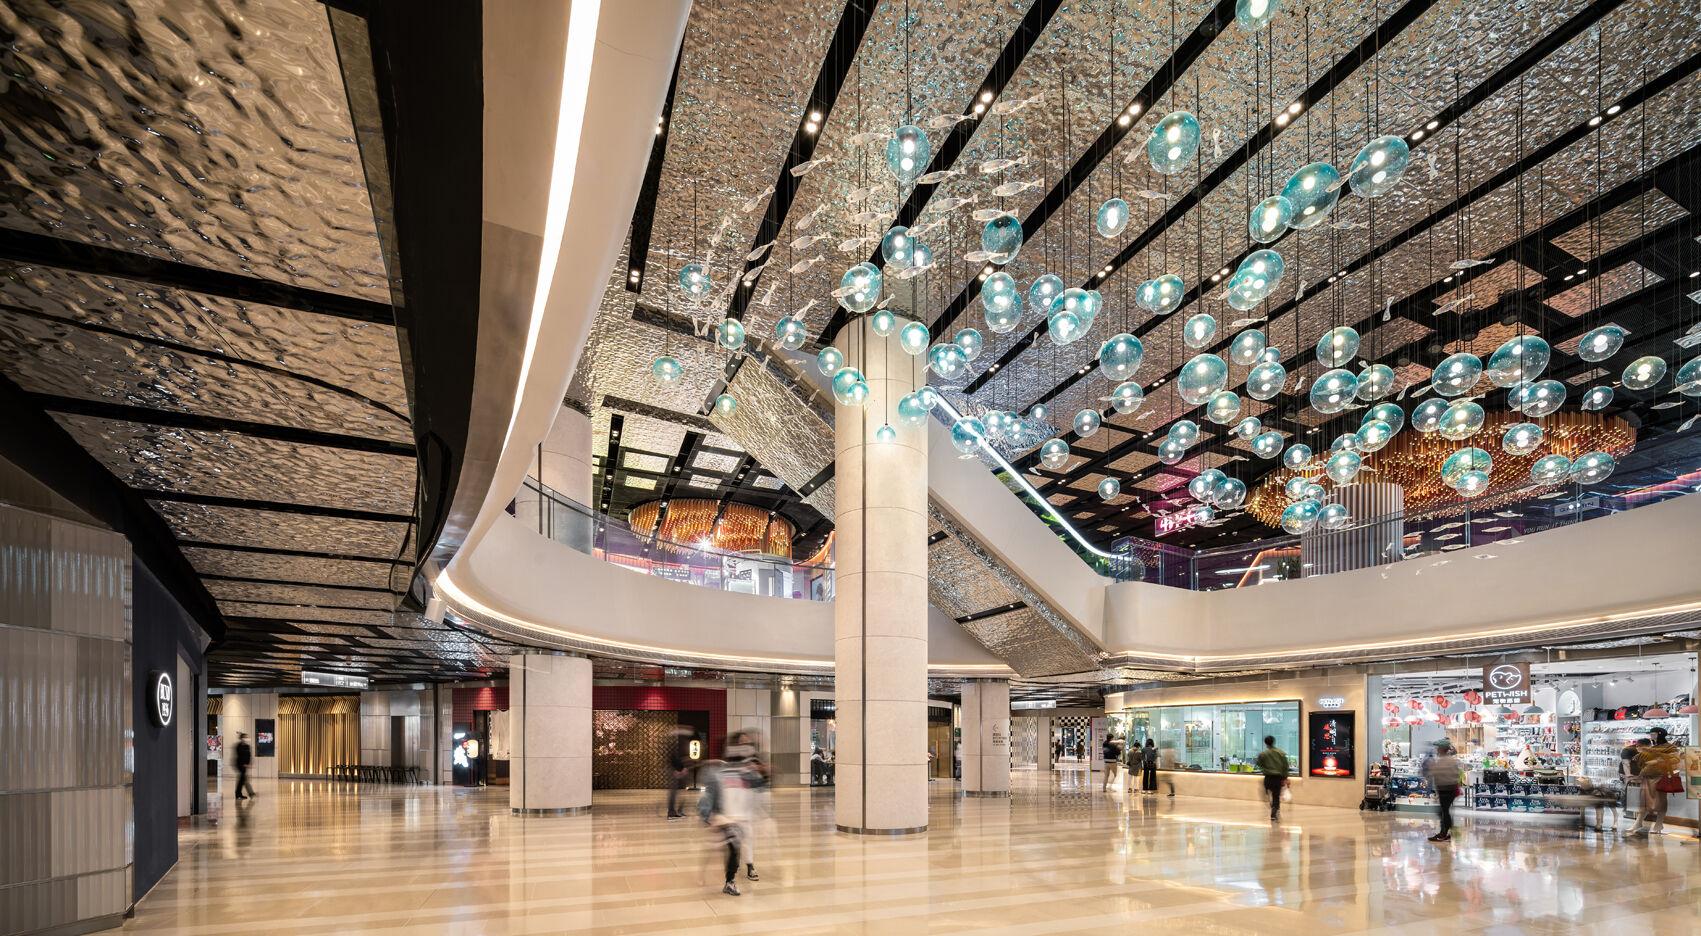 the big atrium on the B2 floor, a scene with more feminine dramatic features.jpg